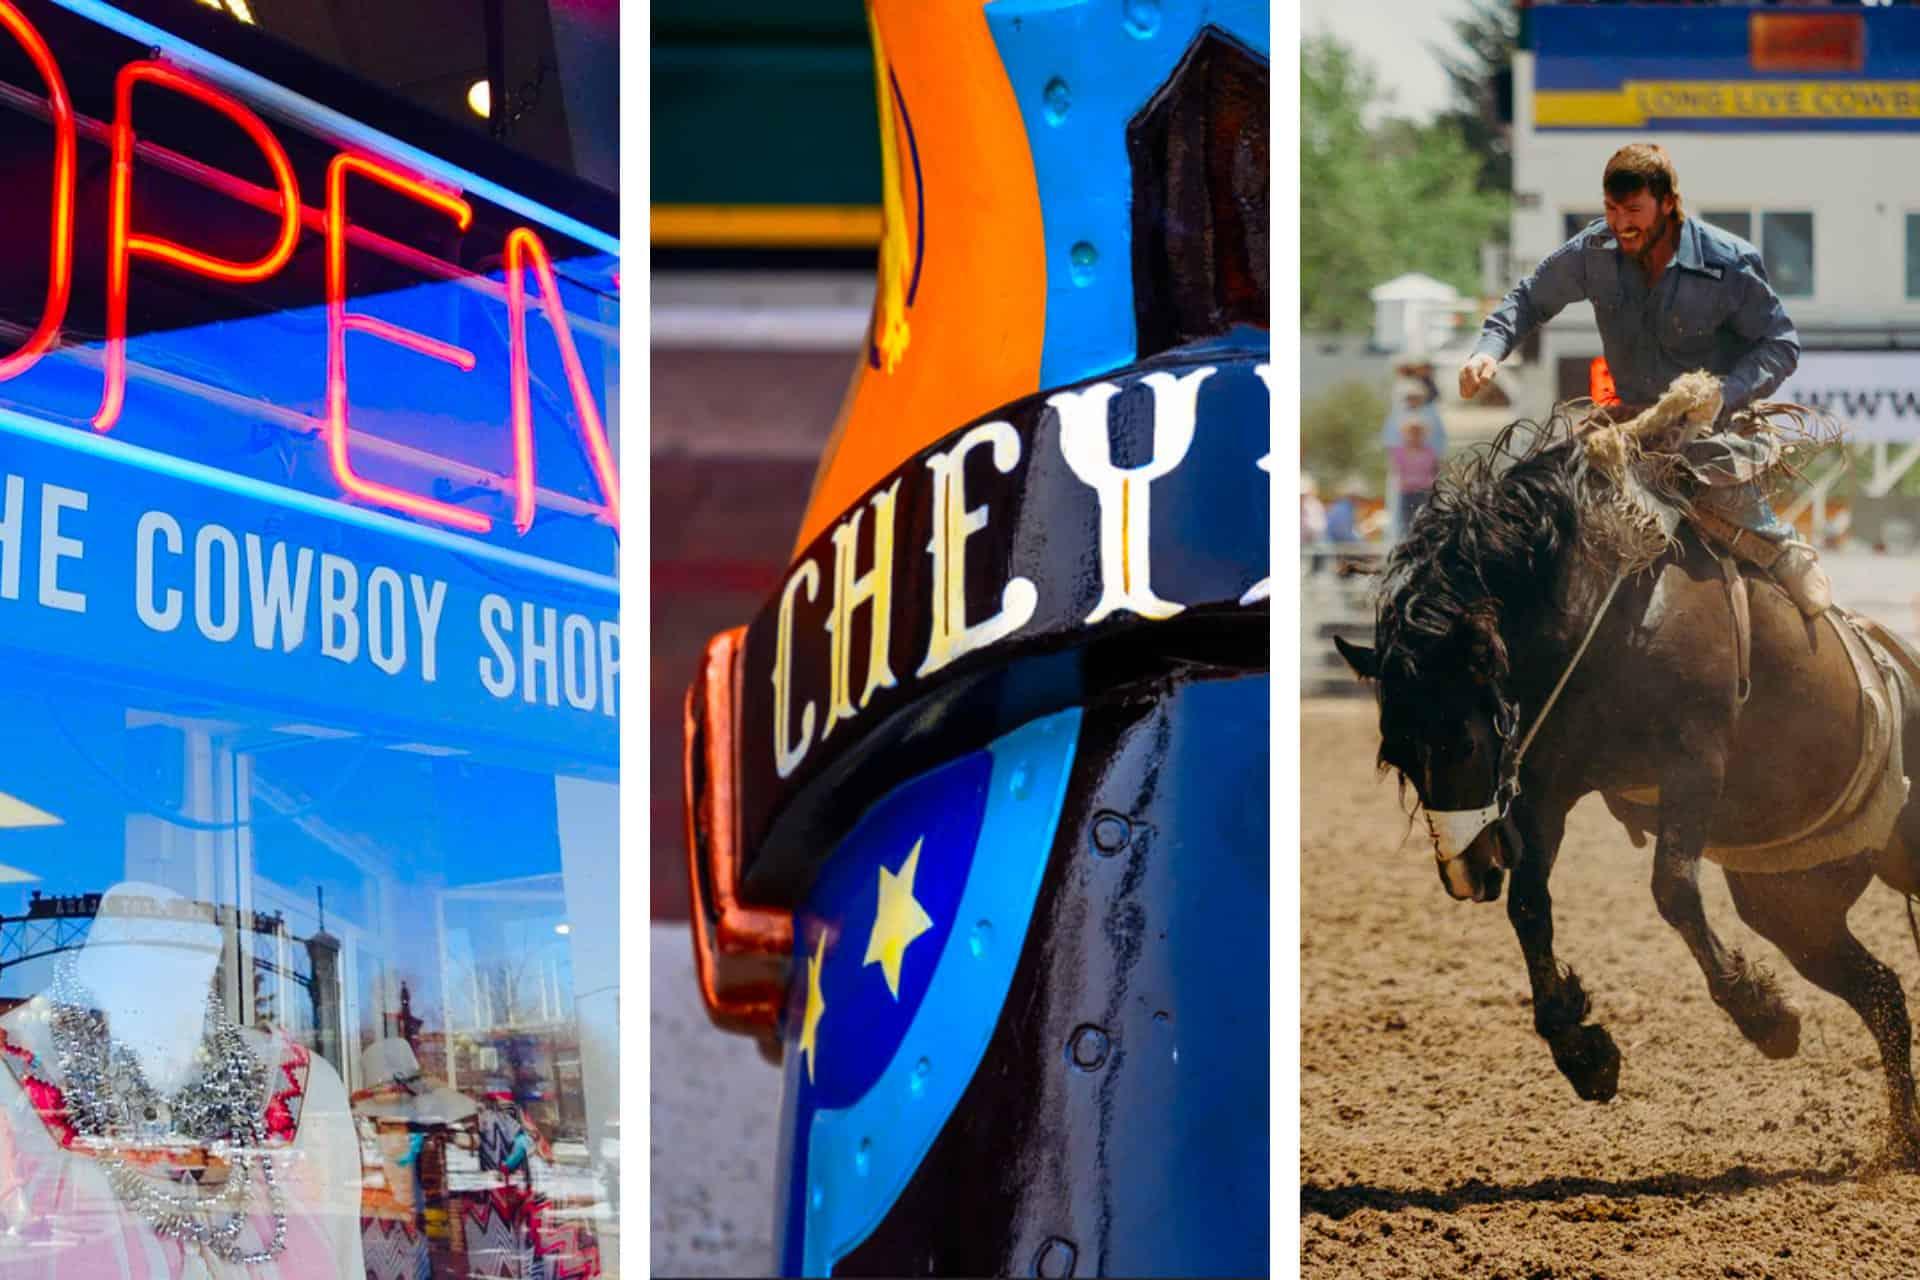 21+ All-American Things to Do in Cheyenne, Wyoming (2021) via @allamericanatlas